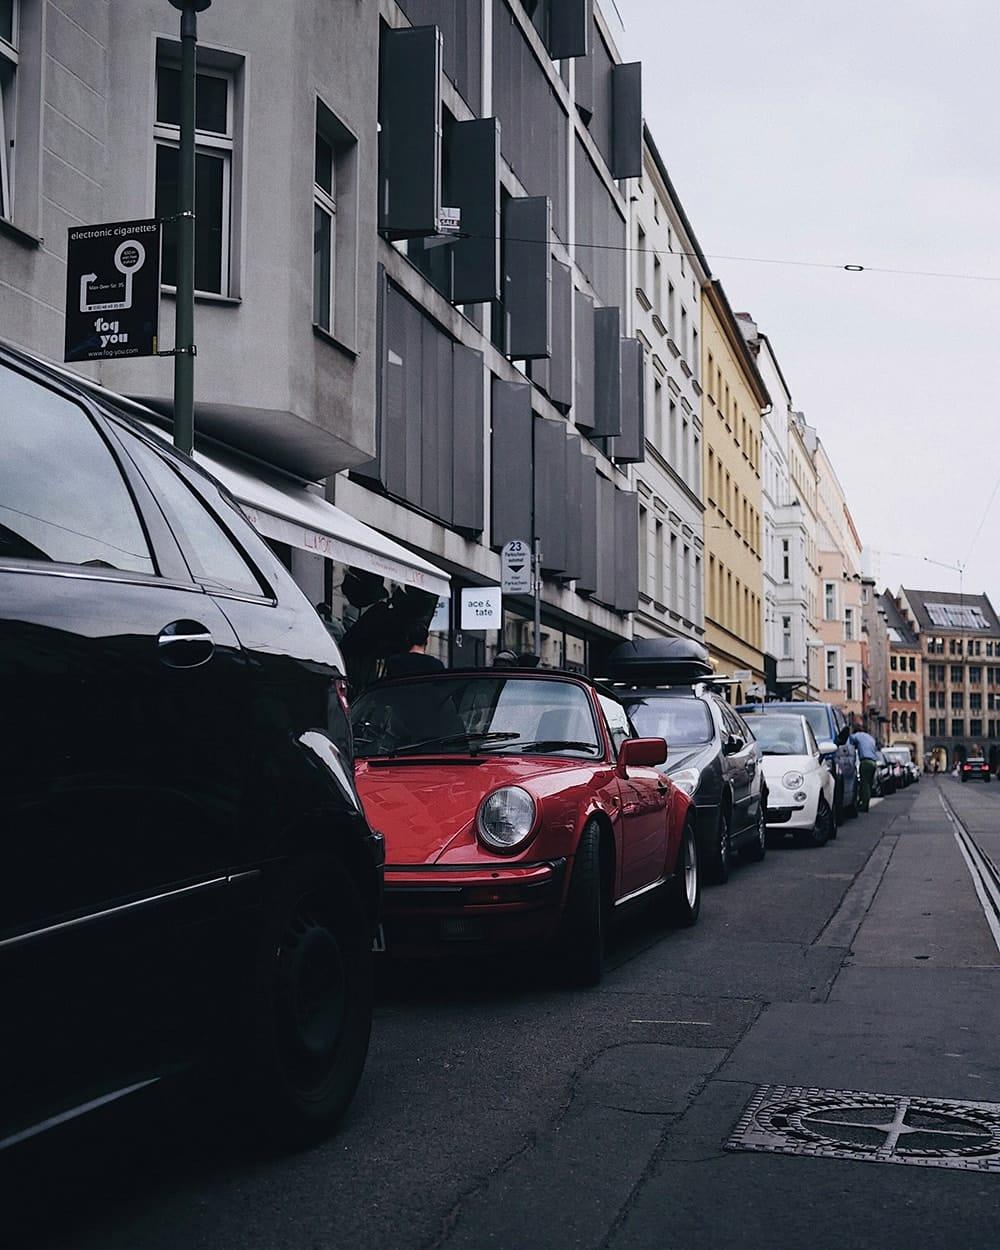 Red vintage Porsche car hidden behind other cars. Berlin